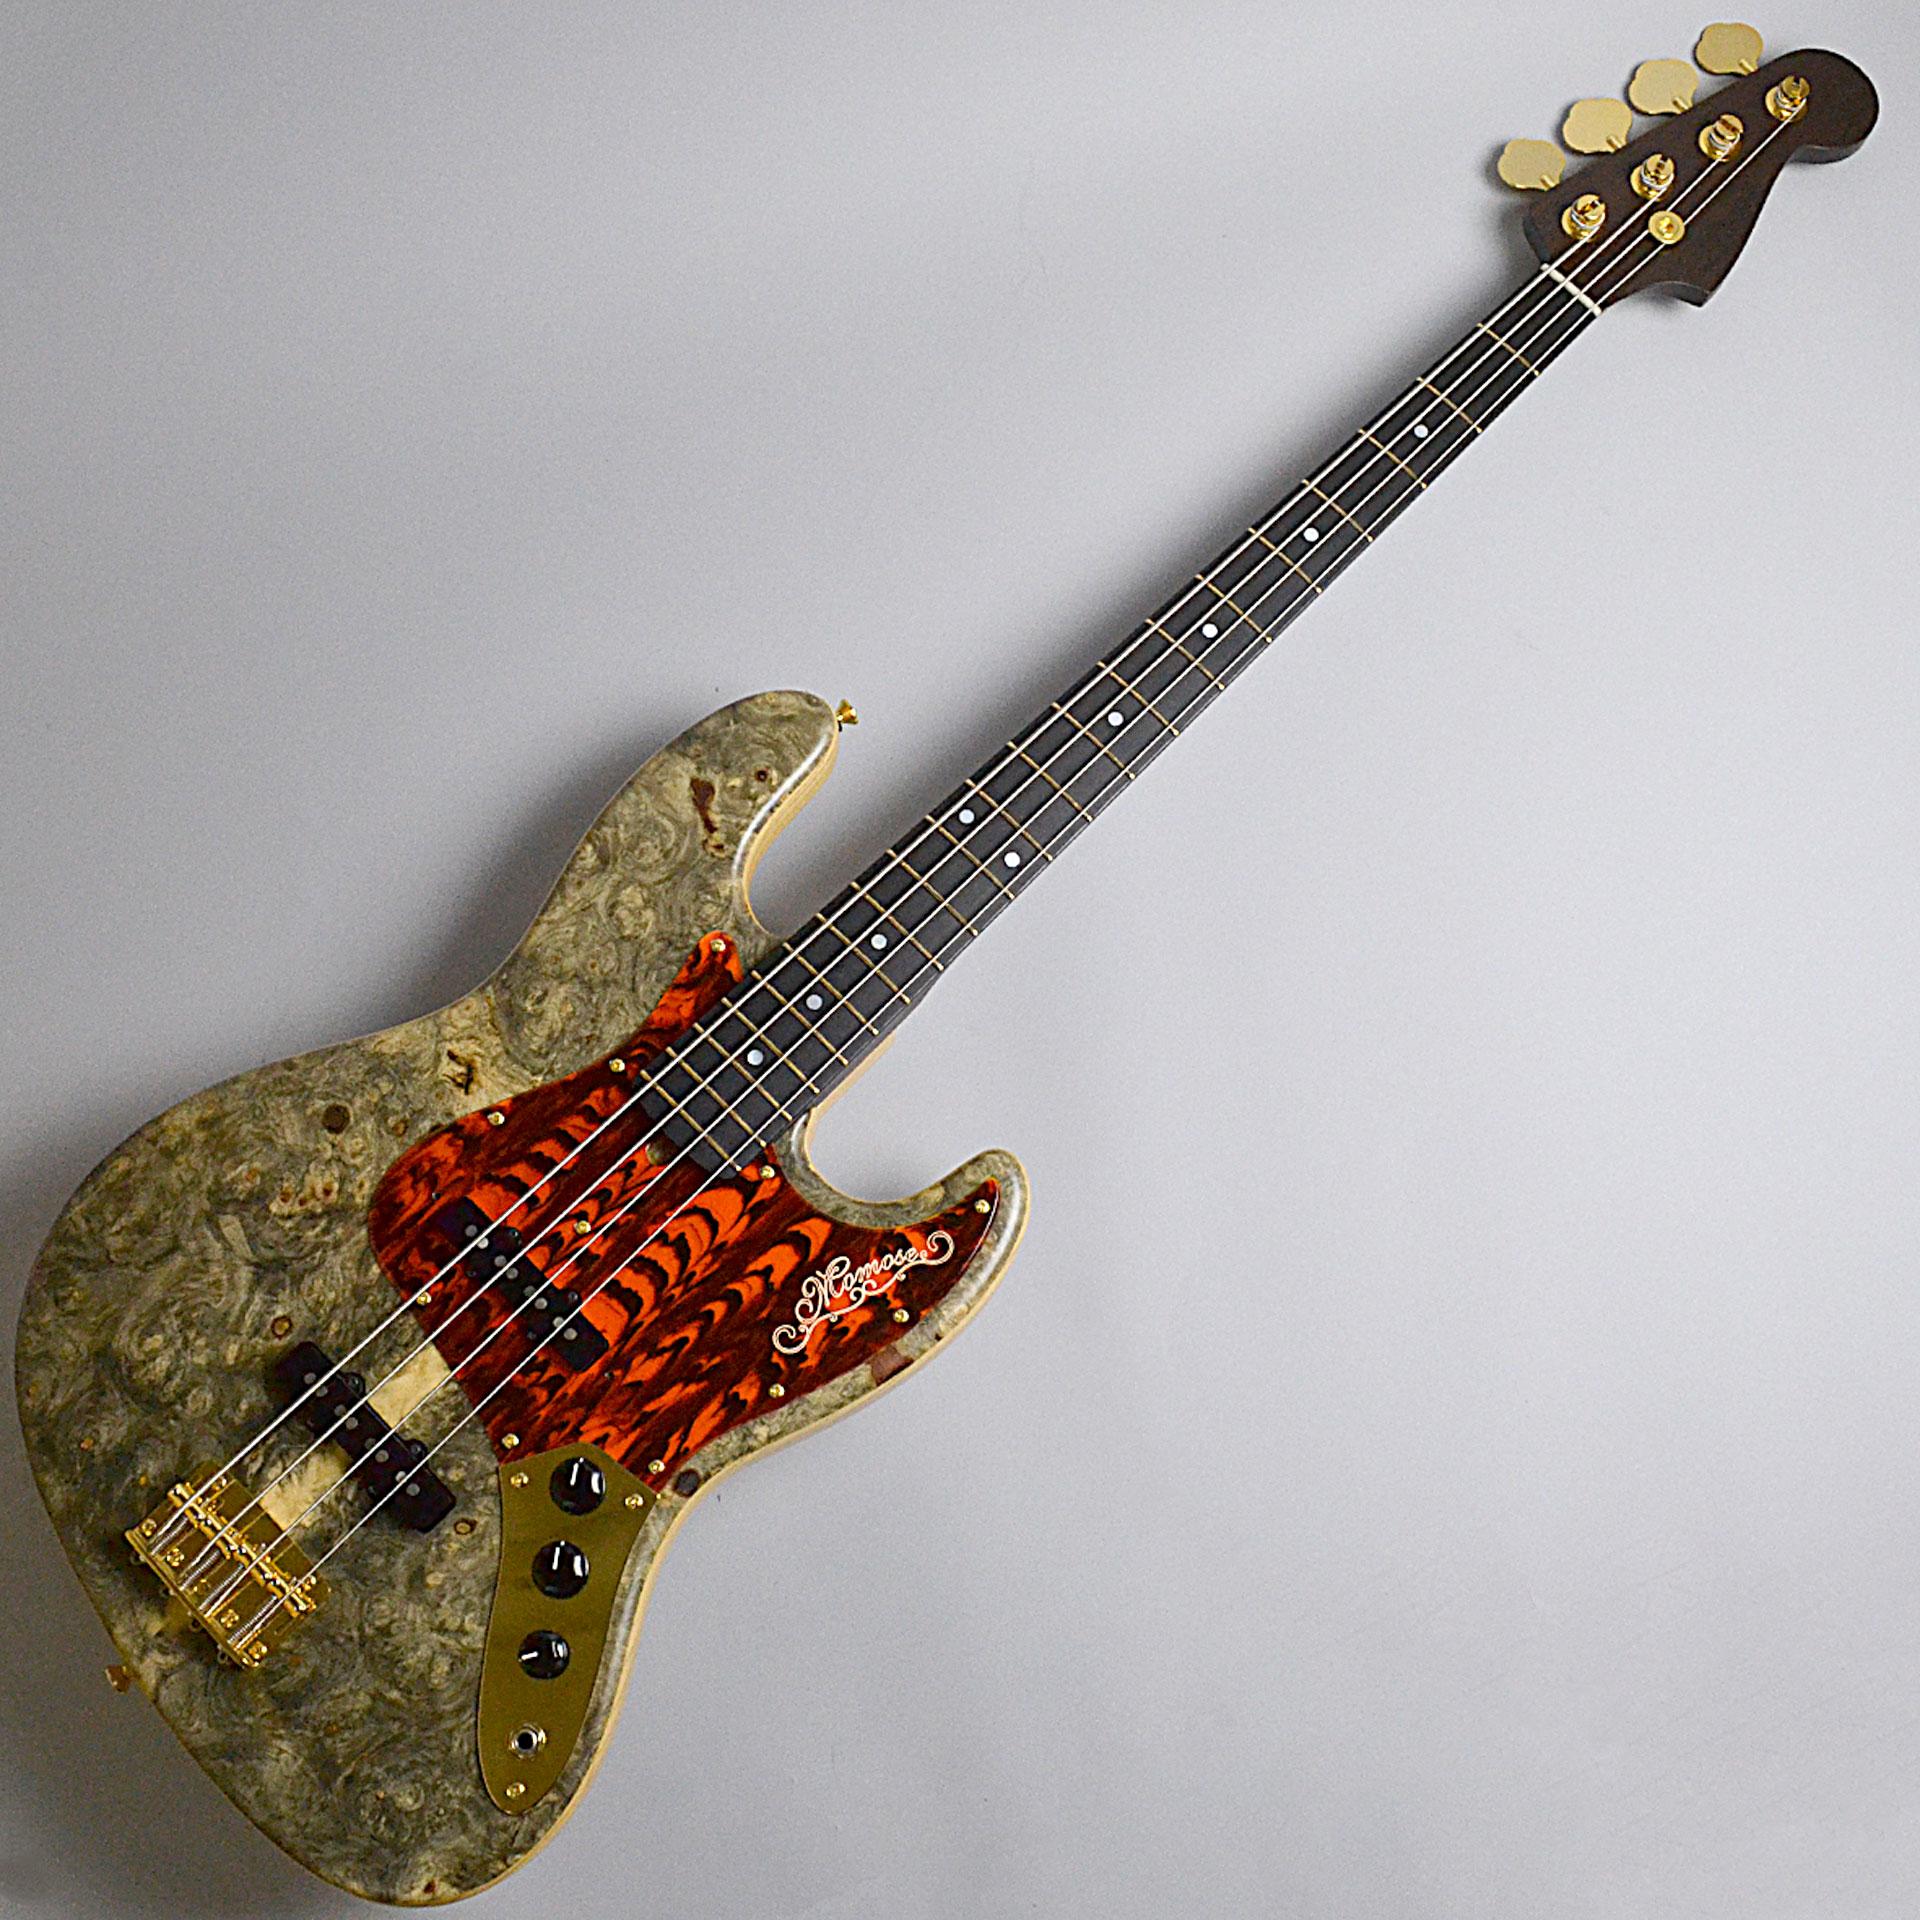 MJB2-BW PRM 楽器フェア限定モデルのボディトップ-アップ画像